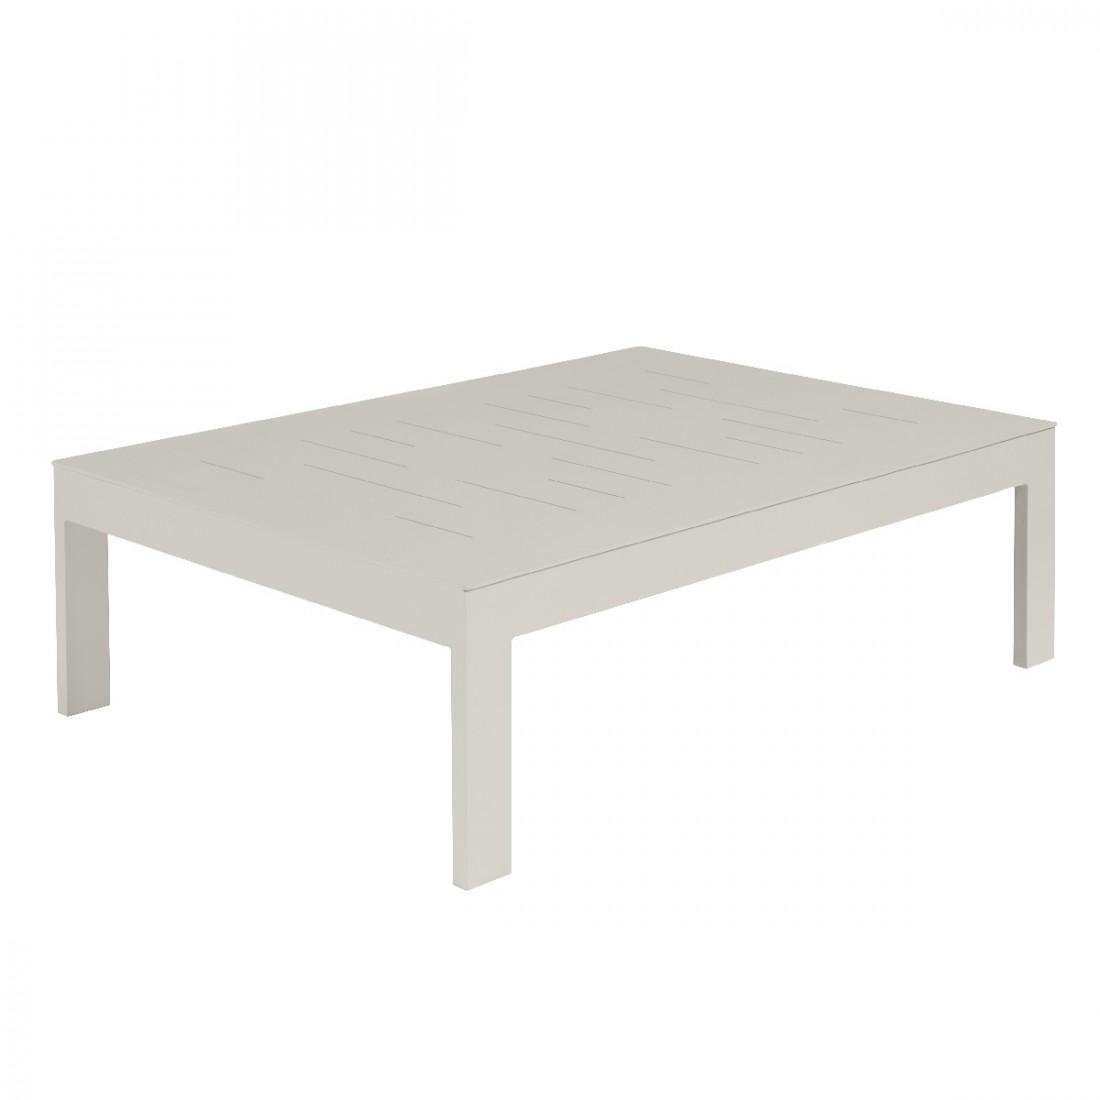 Table basse de jardin sienna 100x70 en alu coloris blanc fum e for Table 100x70